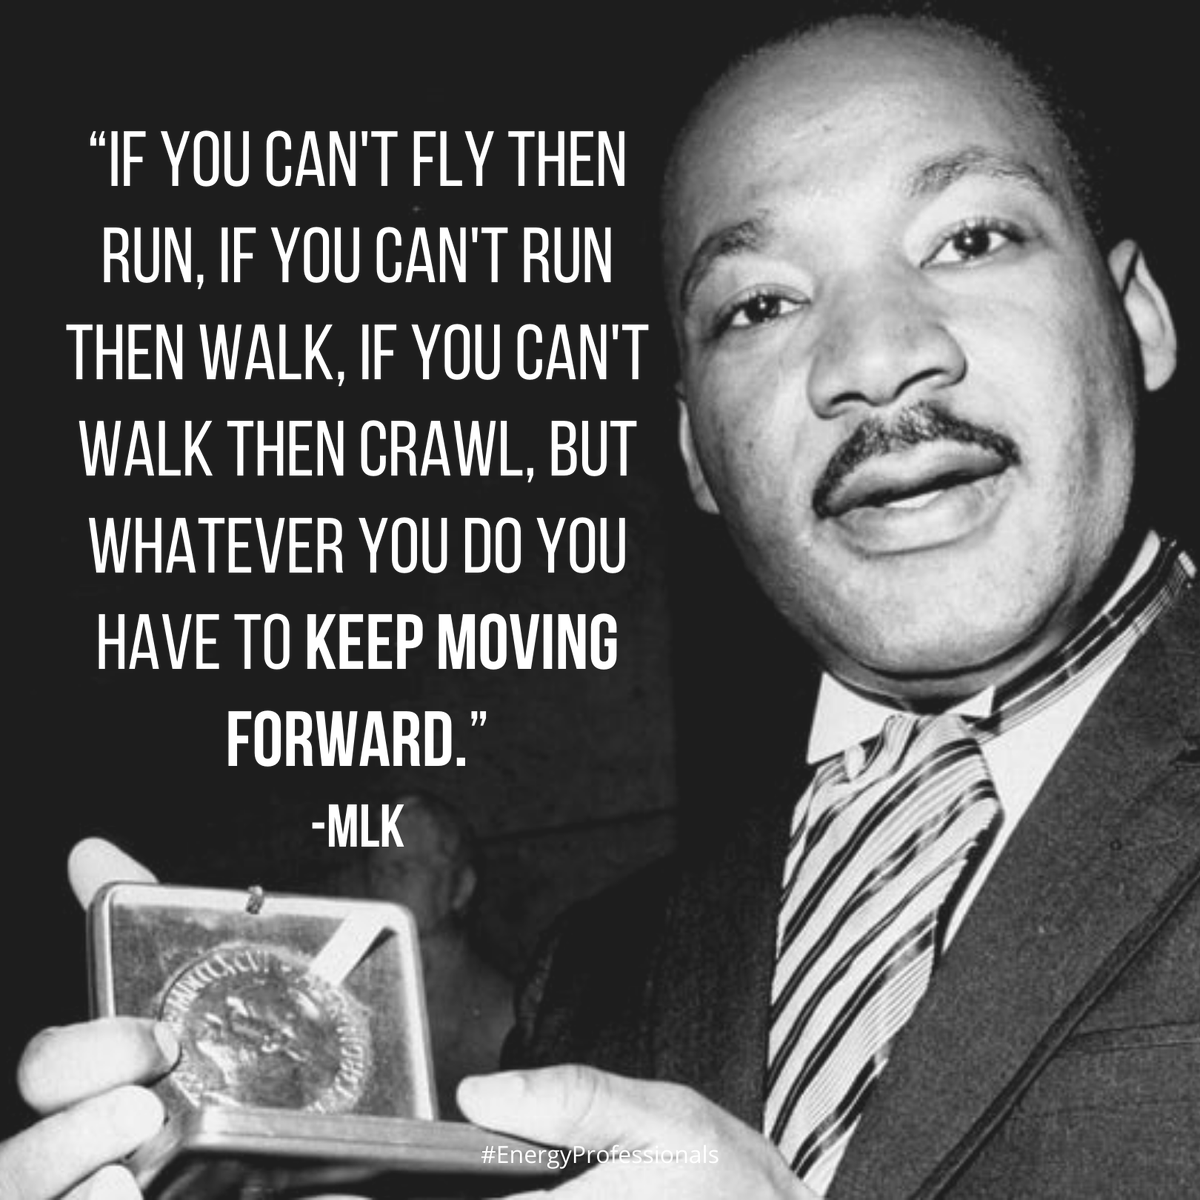 Happy MLK day everyone!   #motivational #motivation #inspiration #keepgoing #mondaymotivation #EnergyProfessionals #MLKDay